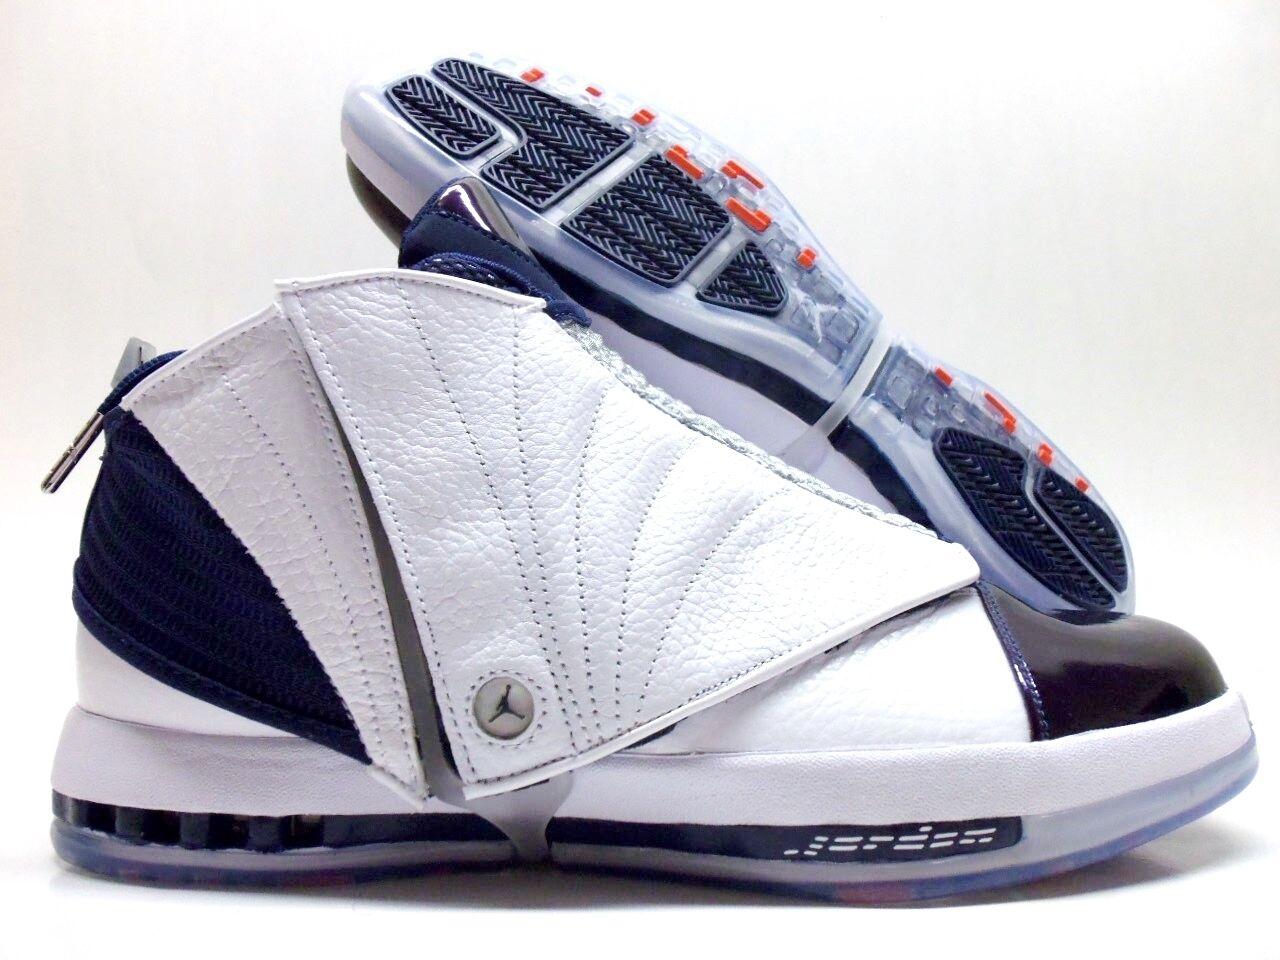 best sneakers 7357e 73f16 ... italy nike air jordan 16 retro weiße männer mitternacht marine größe  männer 10 c5c56 f8070